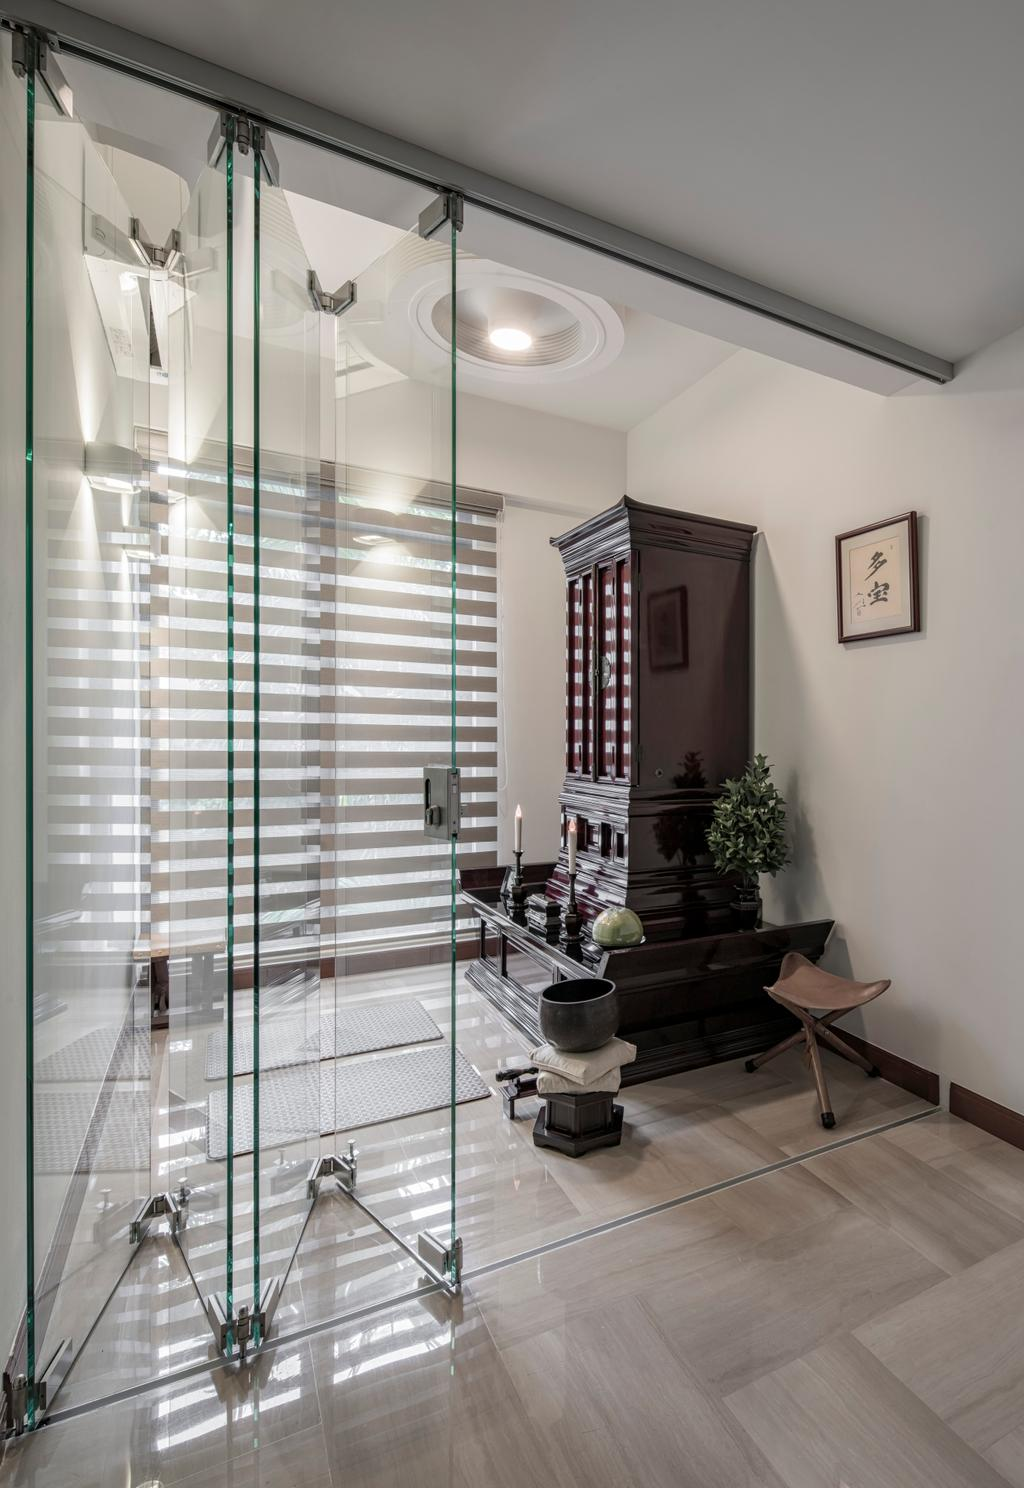 Modern, Condo, East Meadows, Interior Designer, Posh Home, Contemporary, Flora, Jar, Plant, Potted Plant, Pottery, Vase